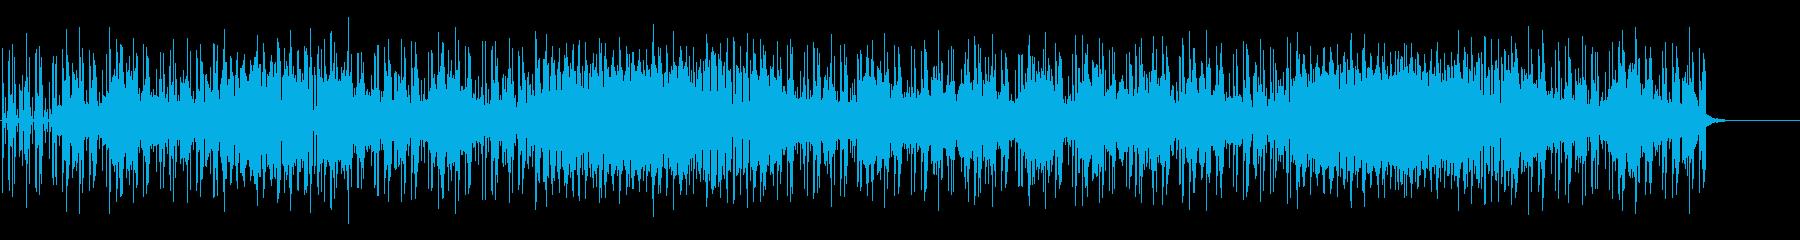 GTRとミュートされたジャズトラン...の再生済みの波形